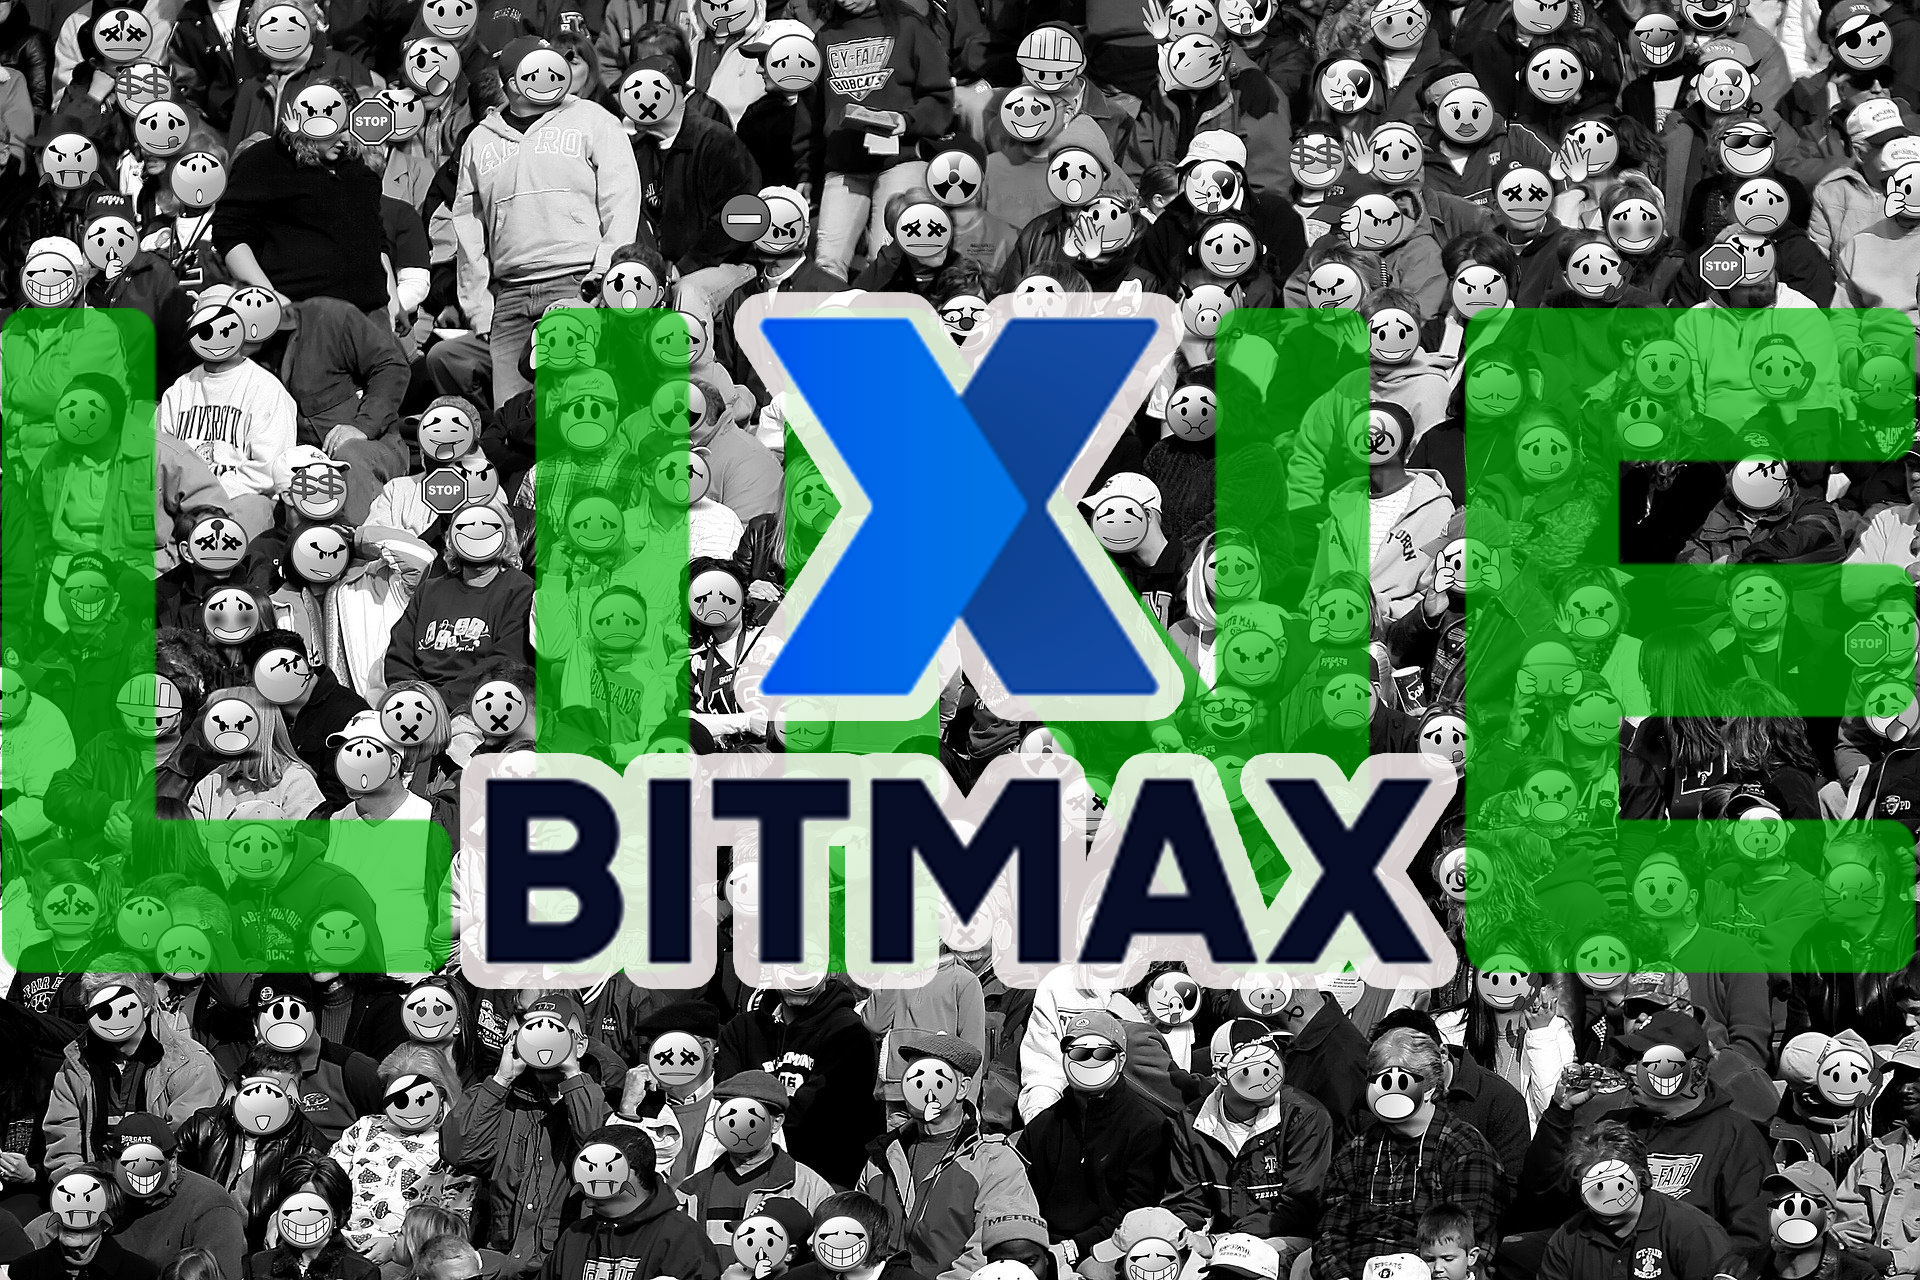 LINEの仮想通貨取引所「BITMAX」、登録ユーザーに関する調査内容を公開